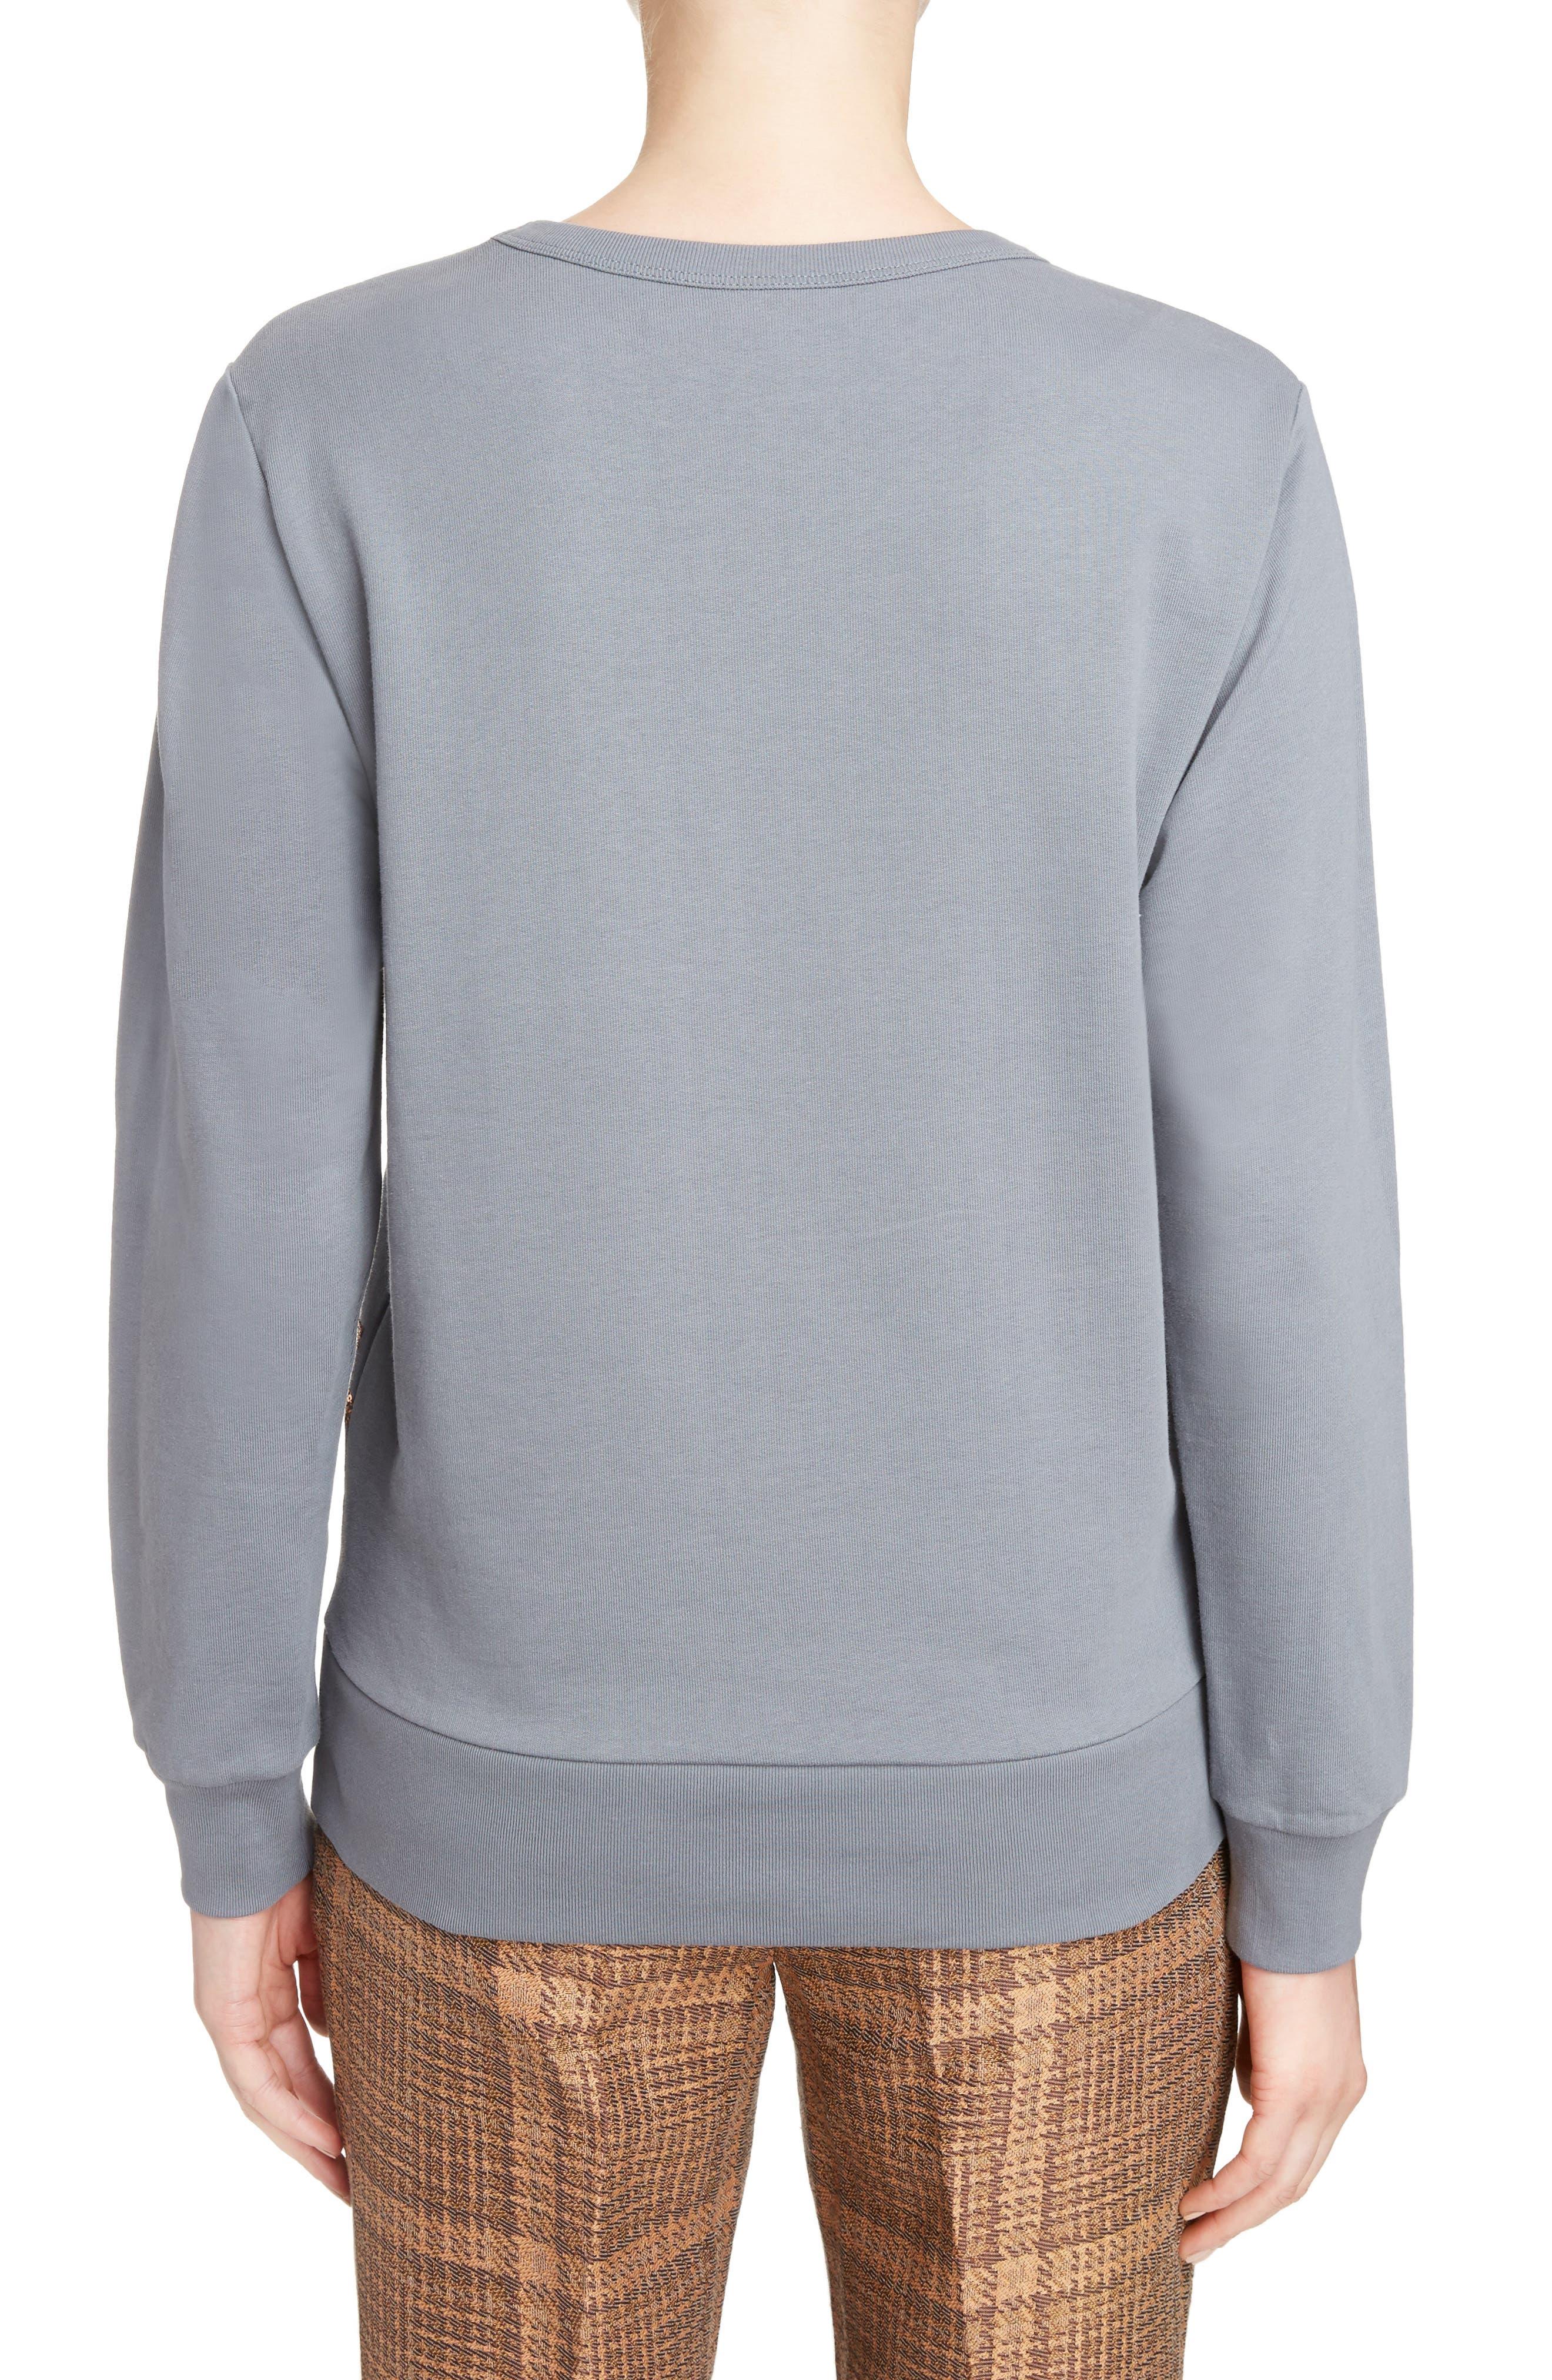 Sequin Embellished Sweatshirt,                             Alternate thumbnail 2, color,                             220